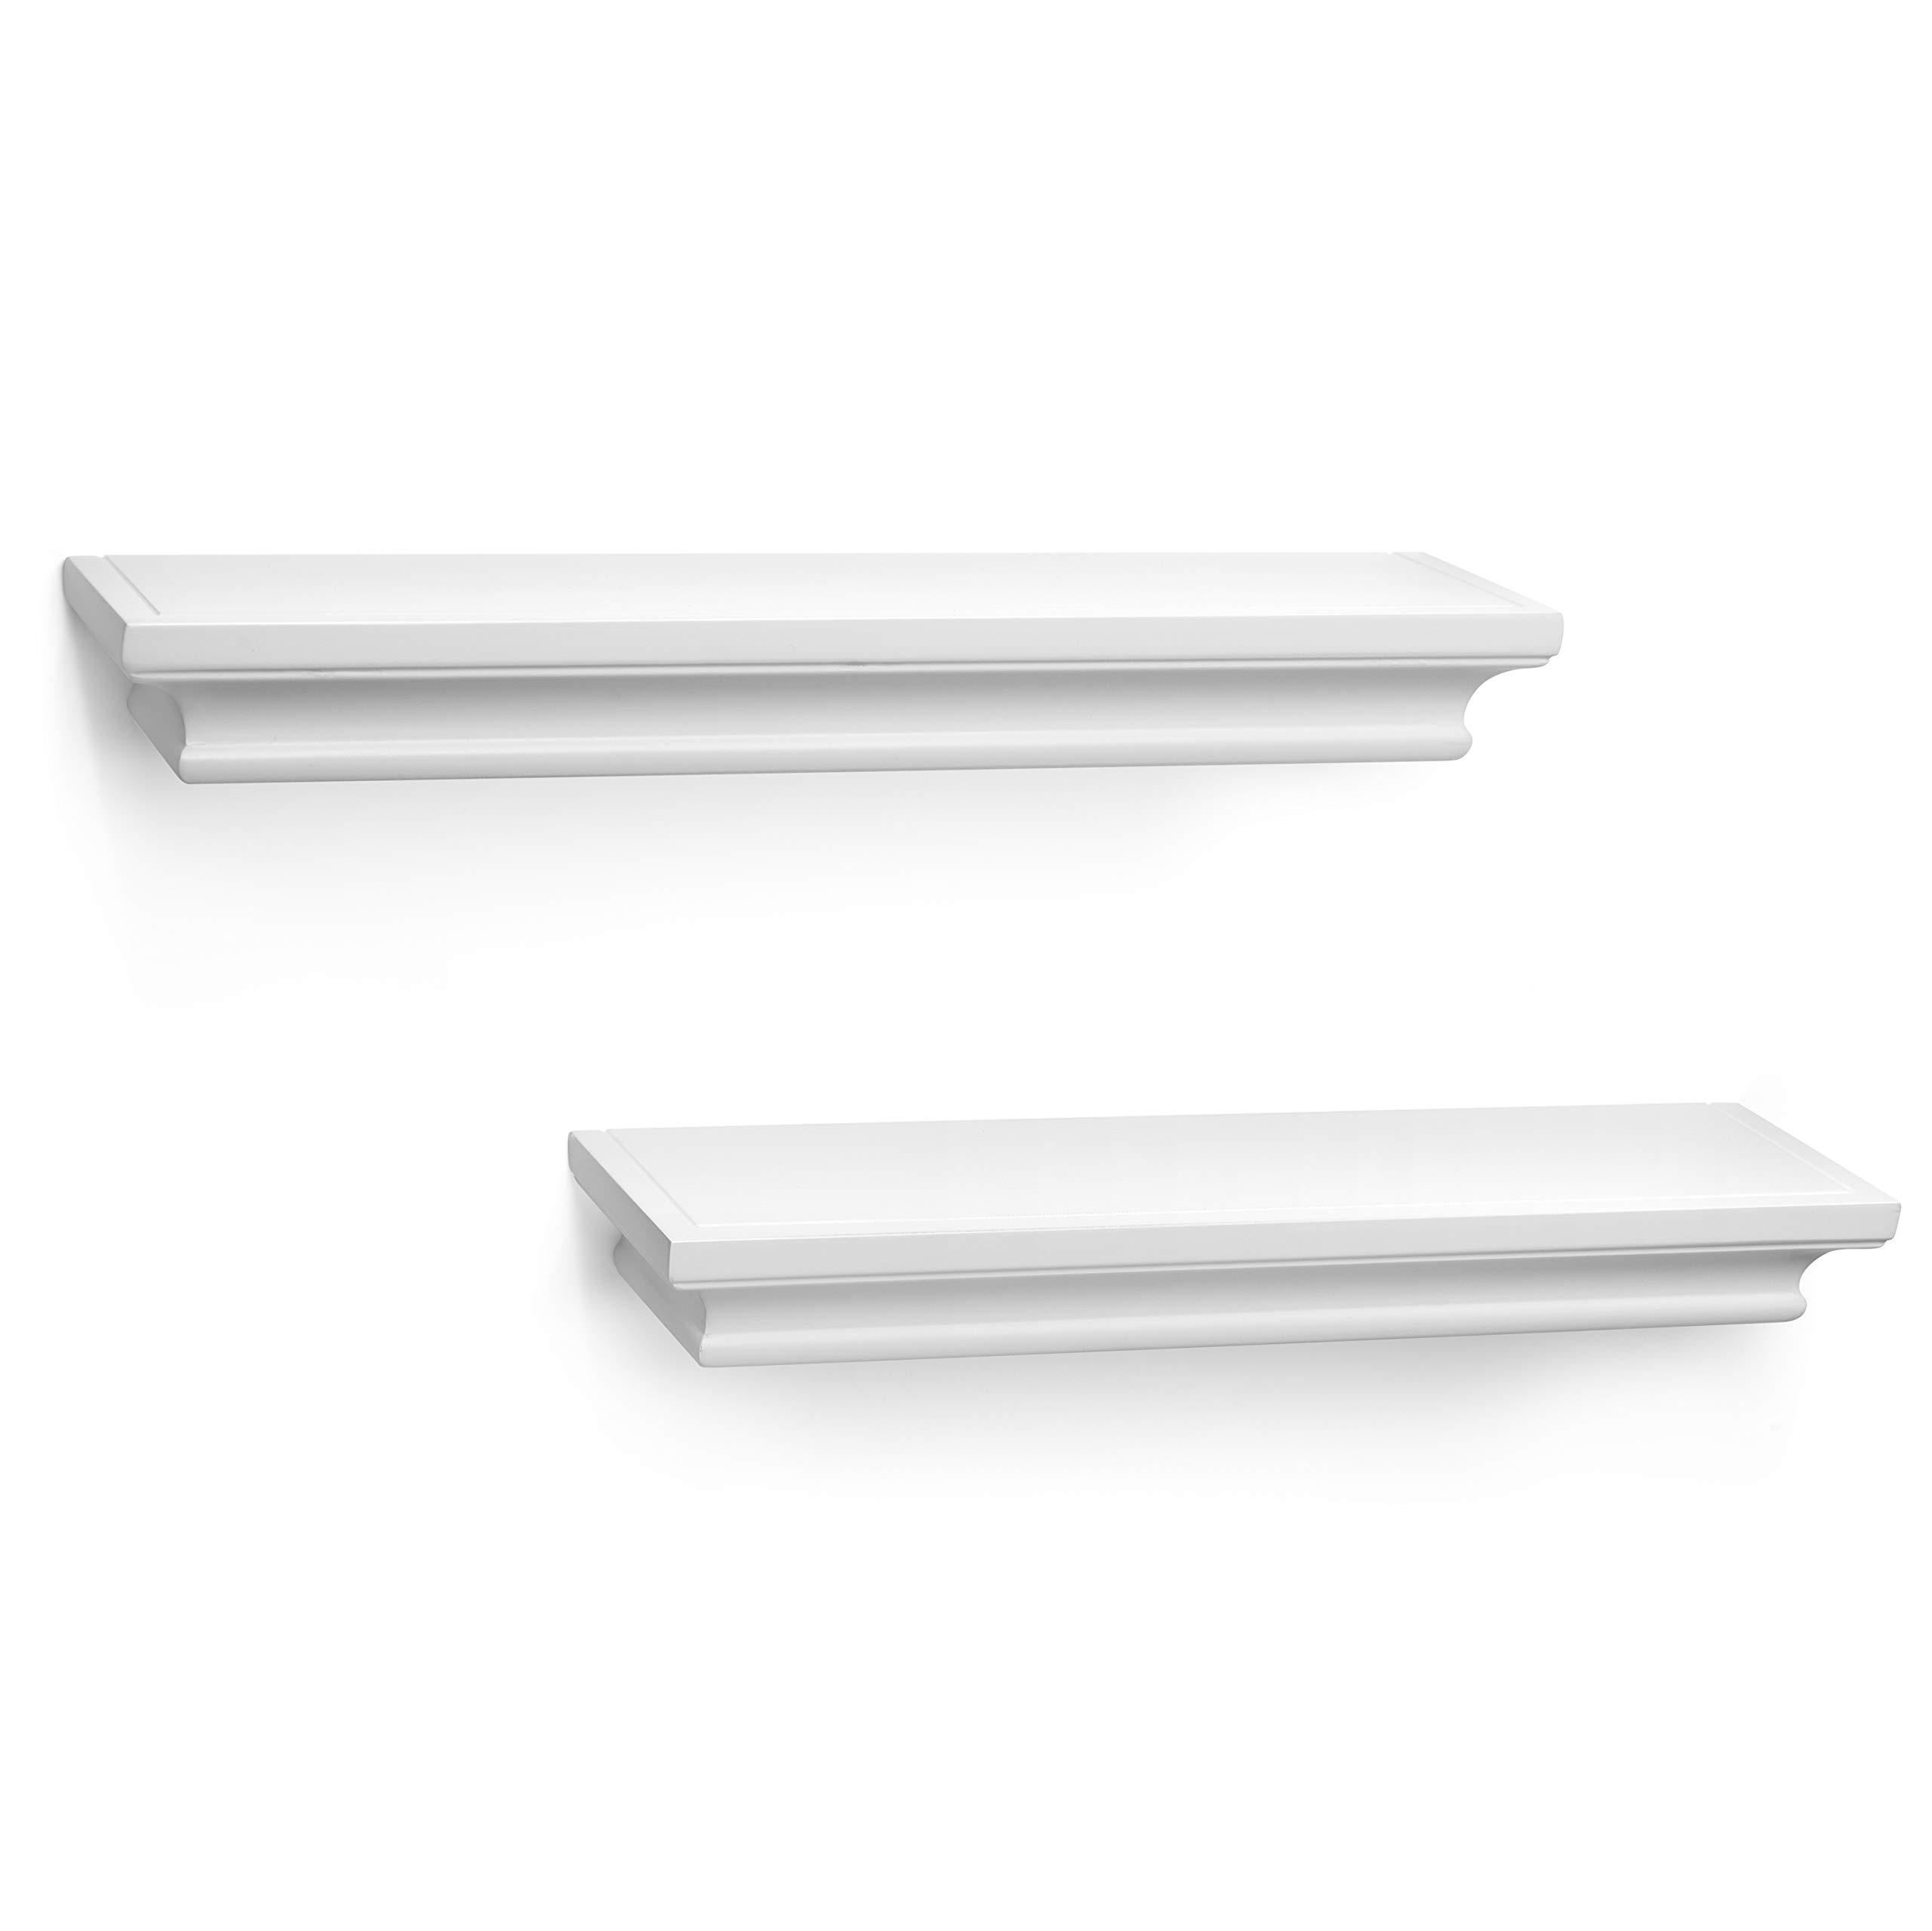 Kloveyleaf Floating Shelves Set of 2 Modern Style Shelves for Bedroom, Kitchen, or Bath, Includes Wall Mounting Hardware (White)